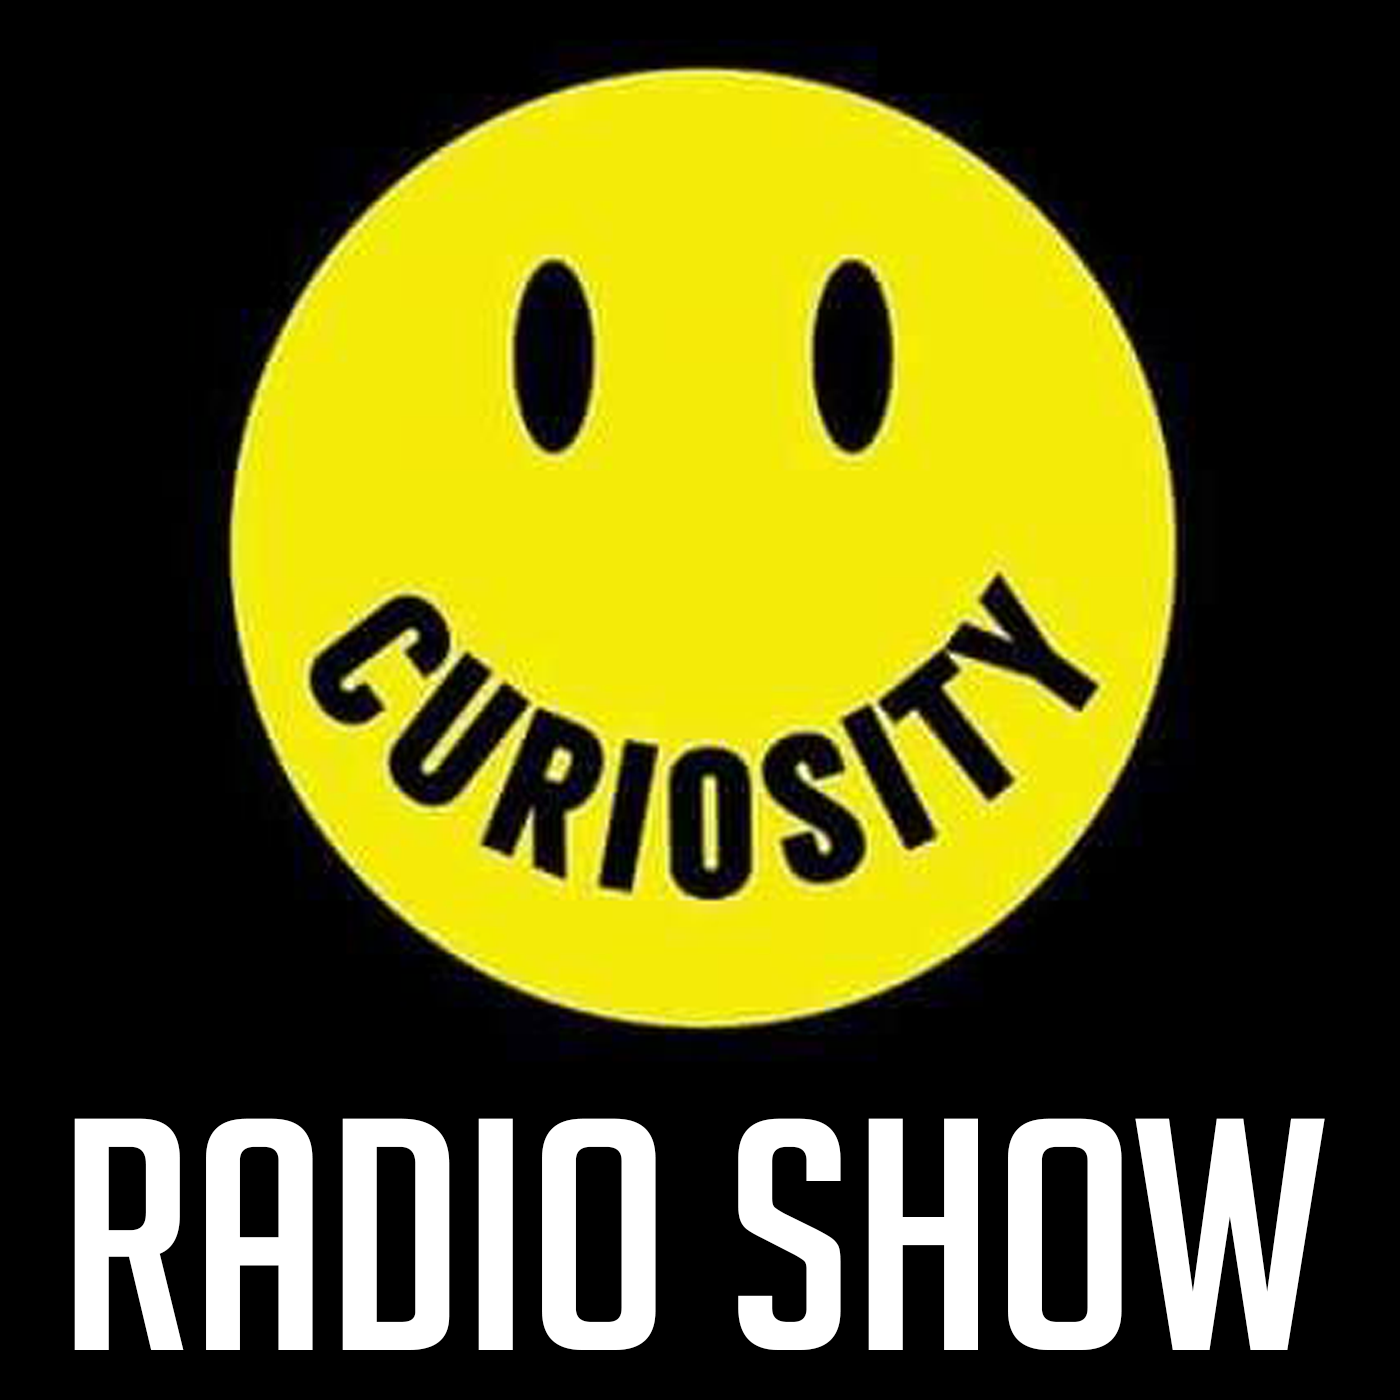 2nd July 2017 (Curiosity Radio Show)